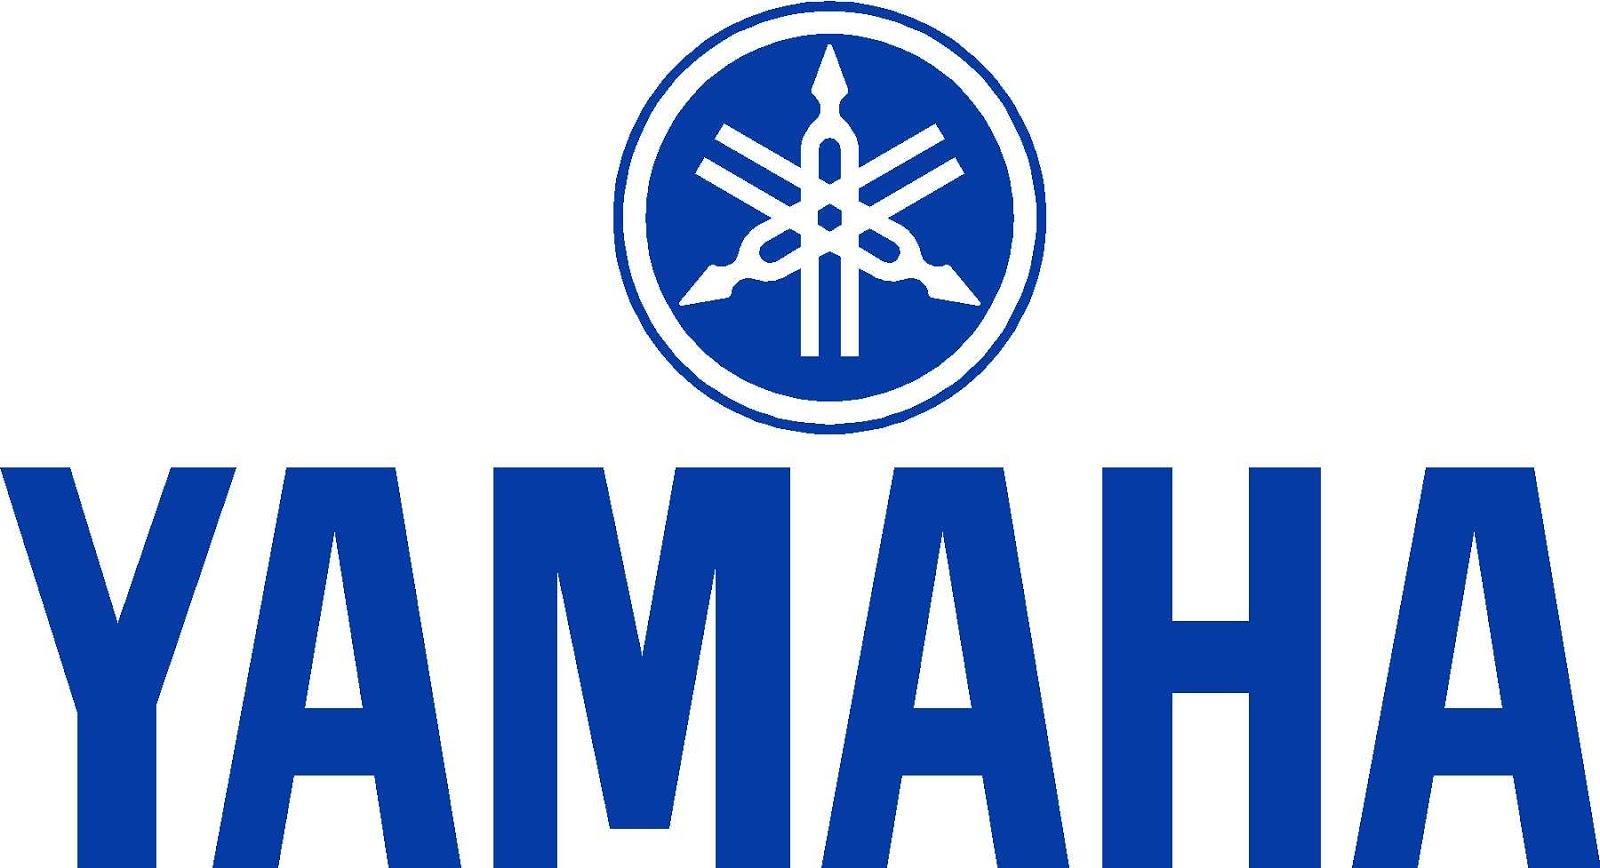 Lowongan Kerja PT Yamaha Motor Manufacturing Indonesia (YMMI) Untuk TIngkat SMP, SMA/SMK, D3 Paling